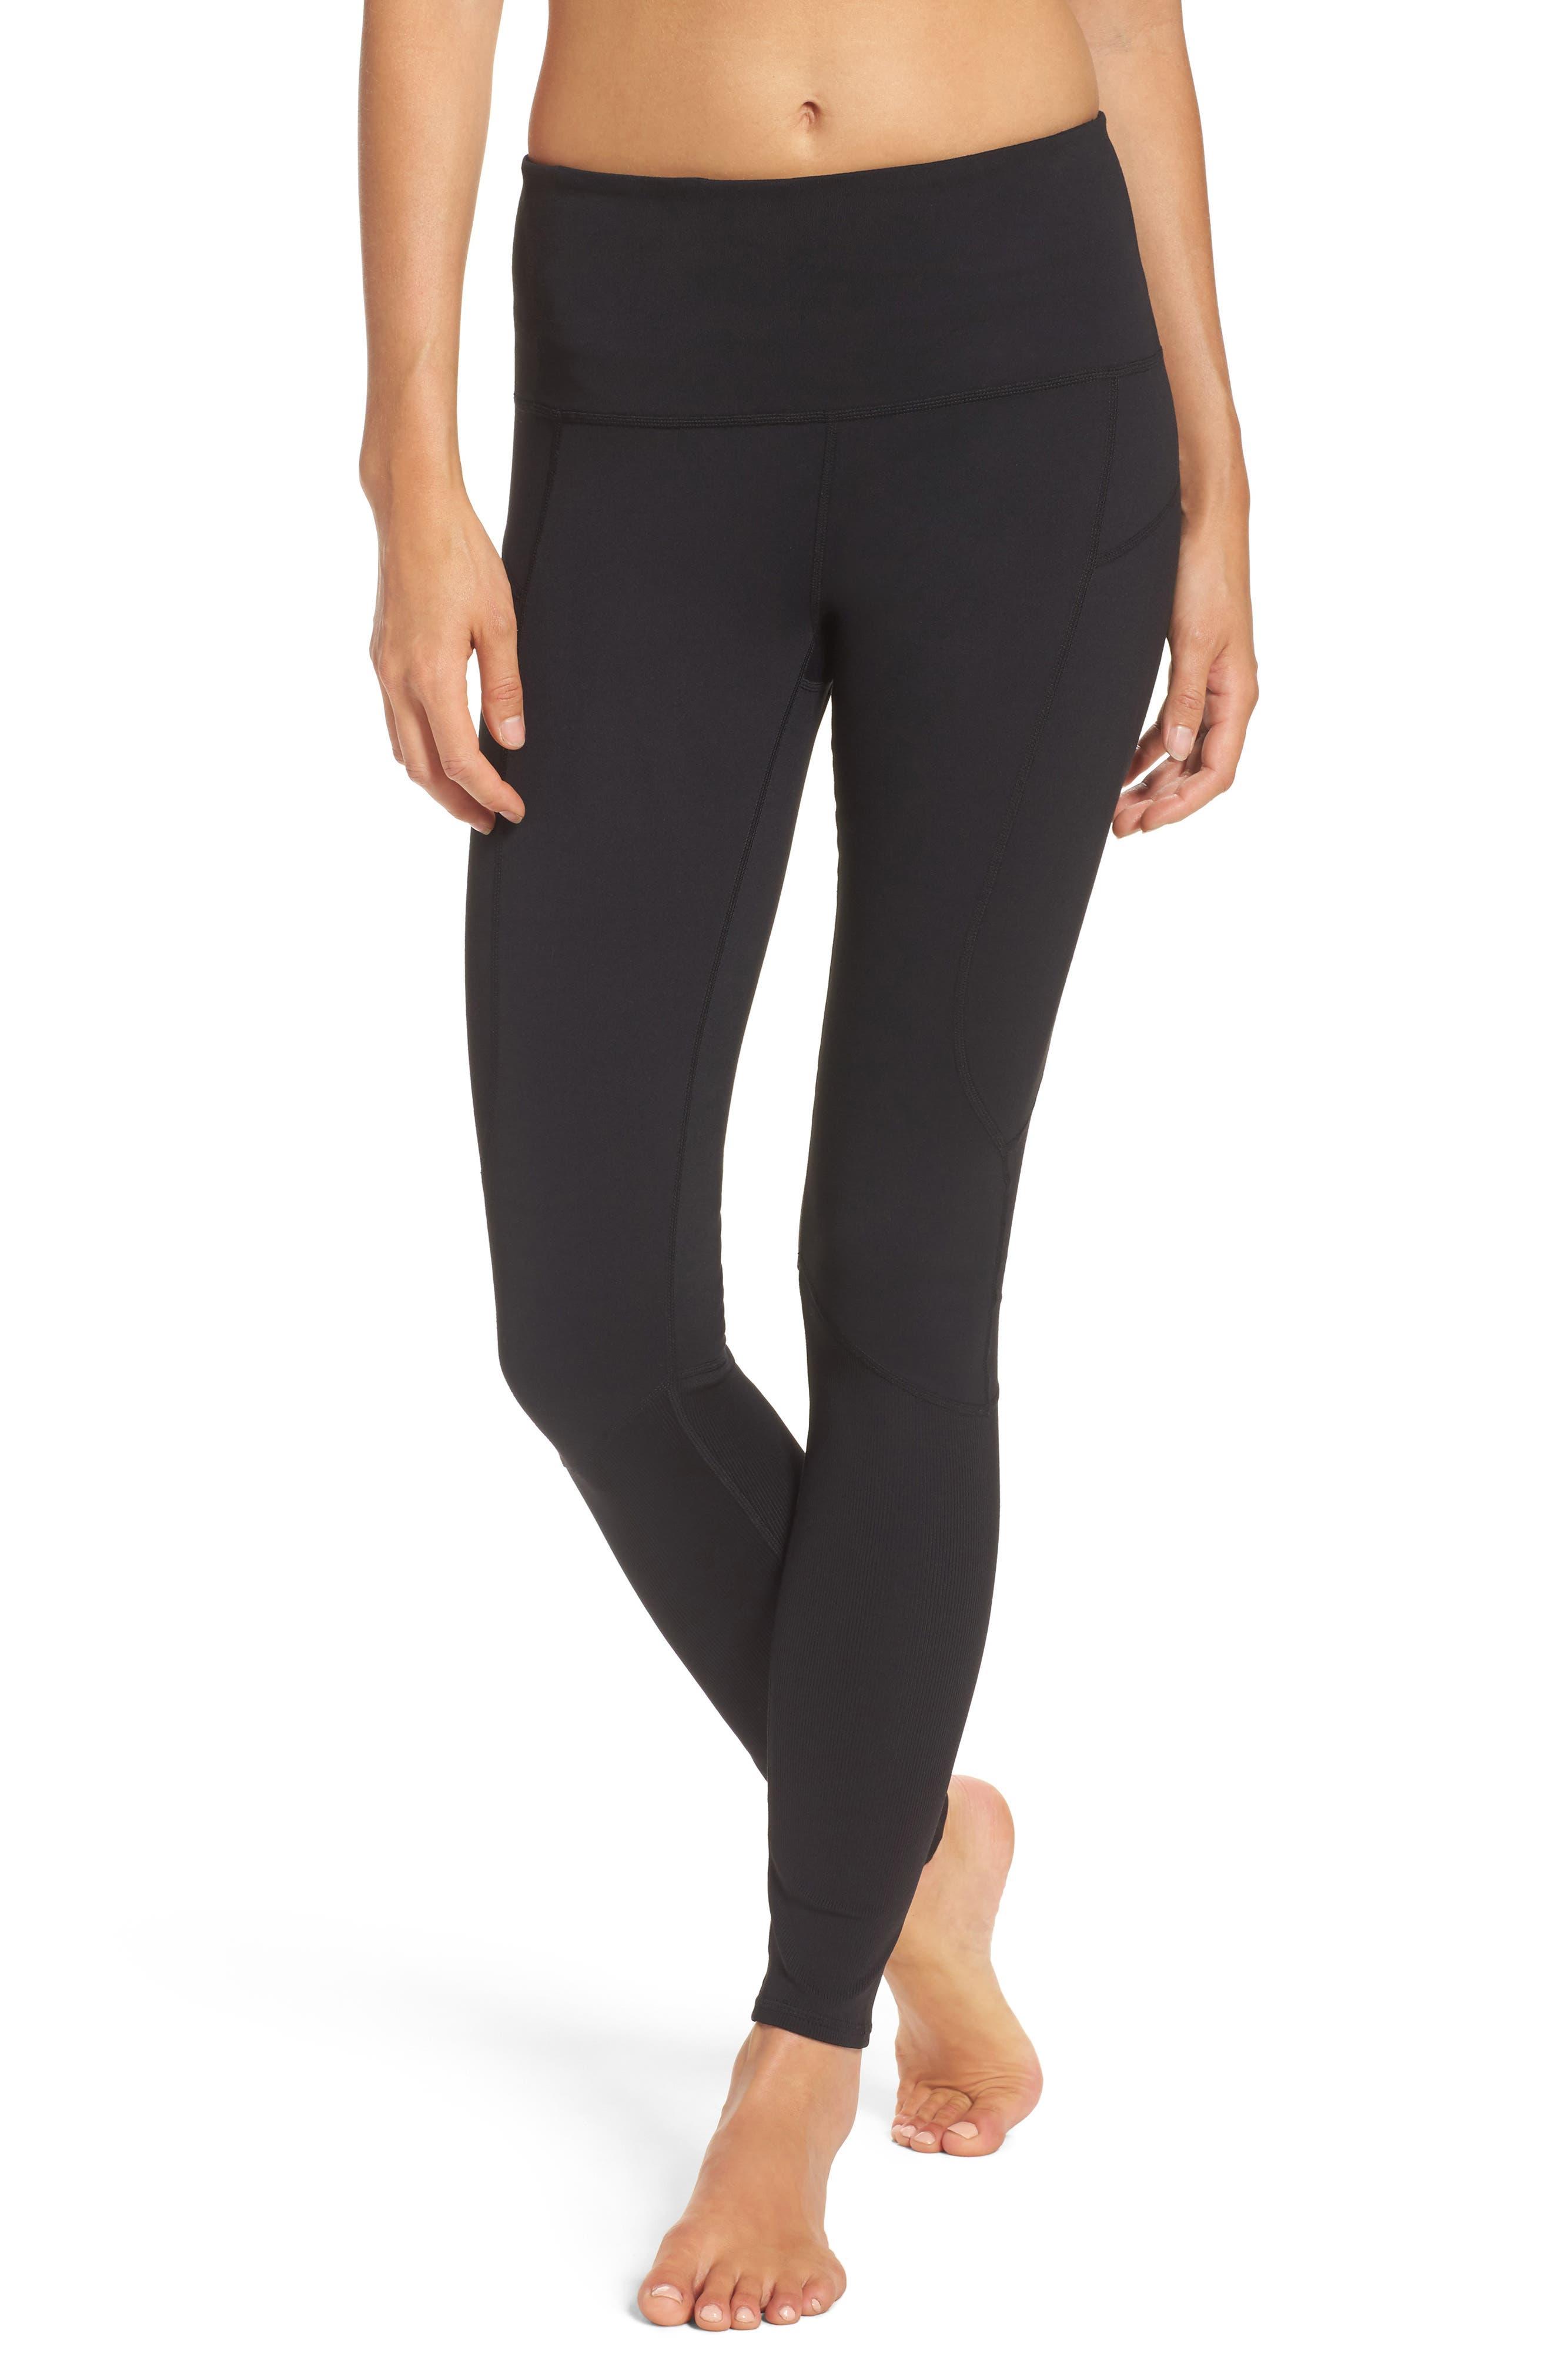 Double Dare High Waist Leggings,                         Main,                         color, Black